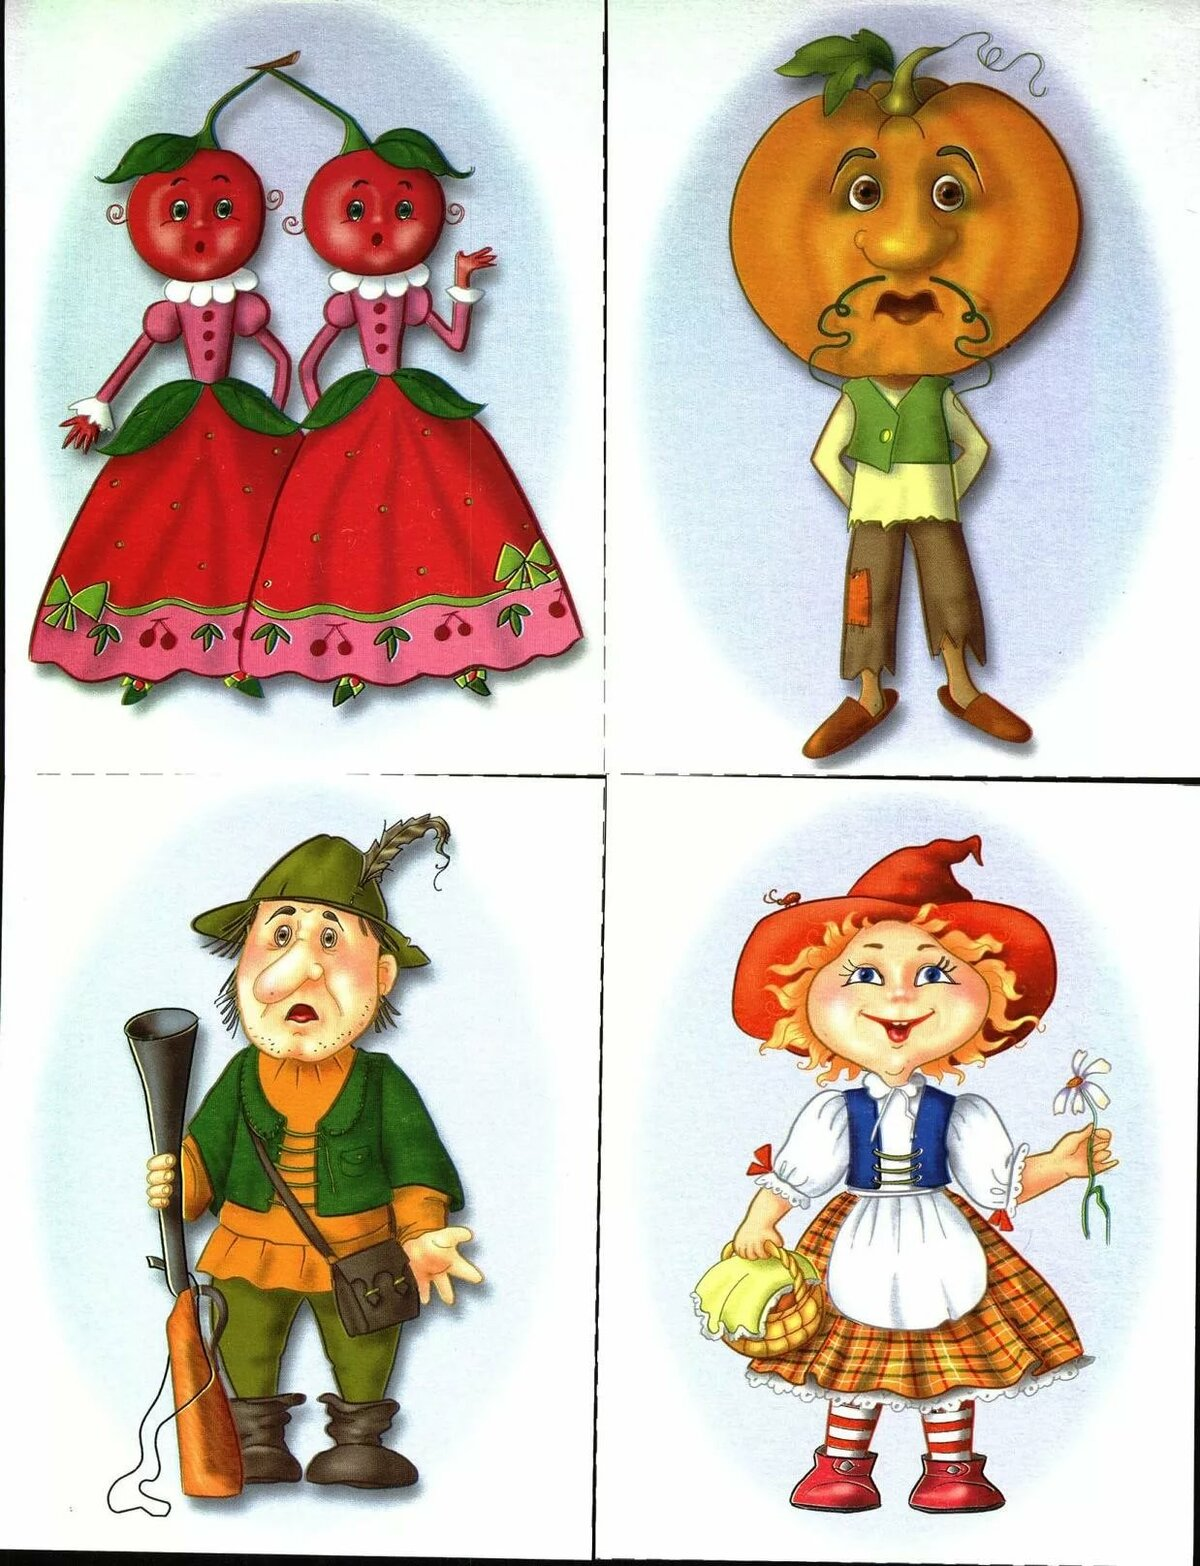 картинки сказочного героя эмоции романтичная юбка-татьянка